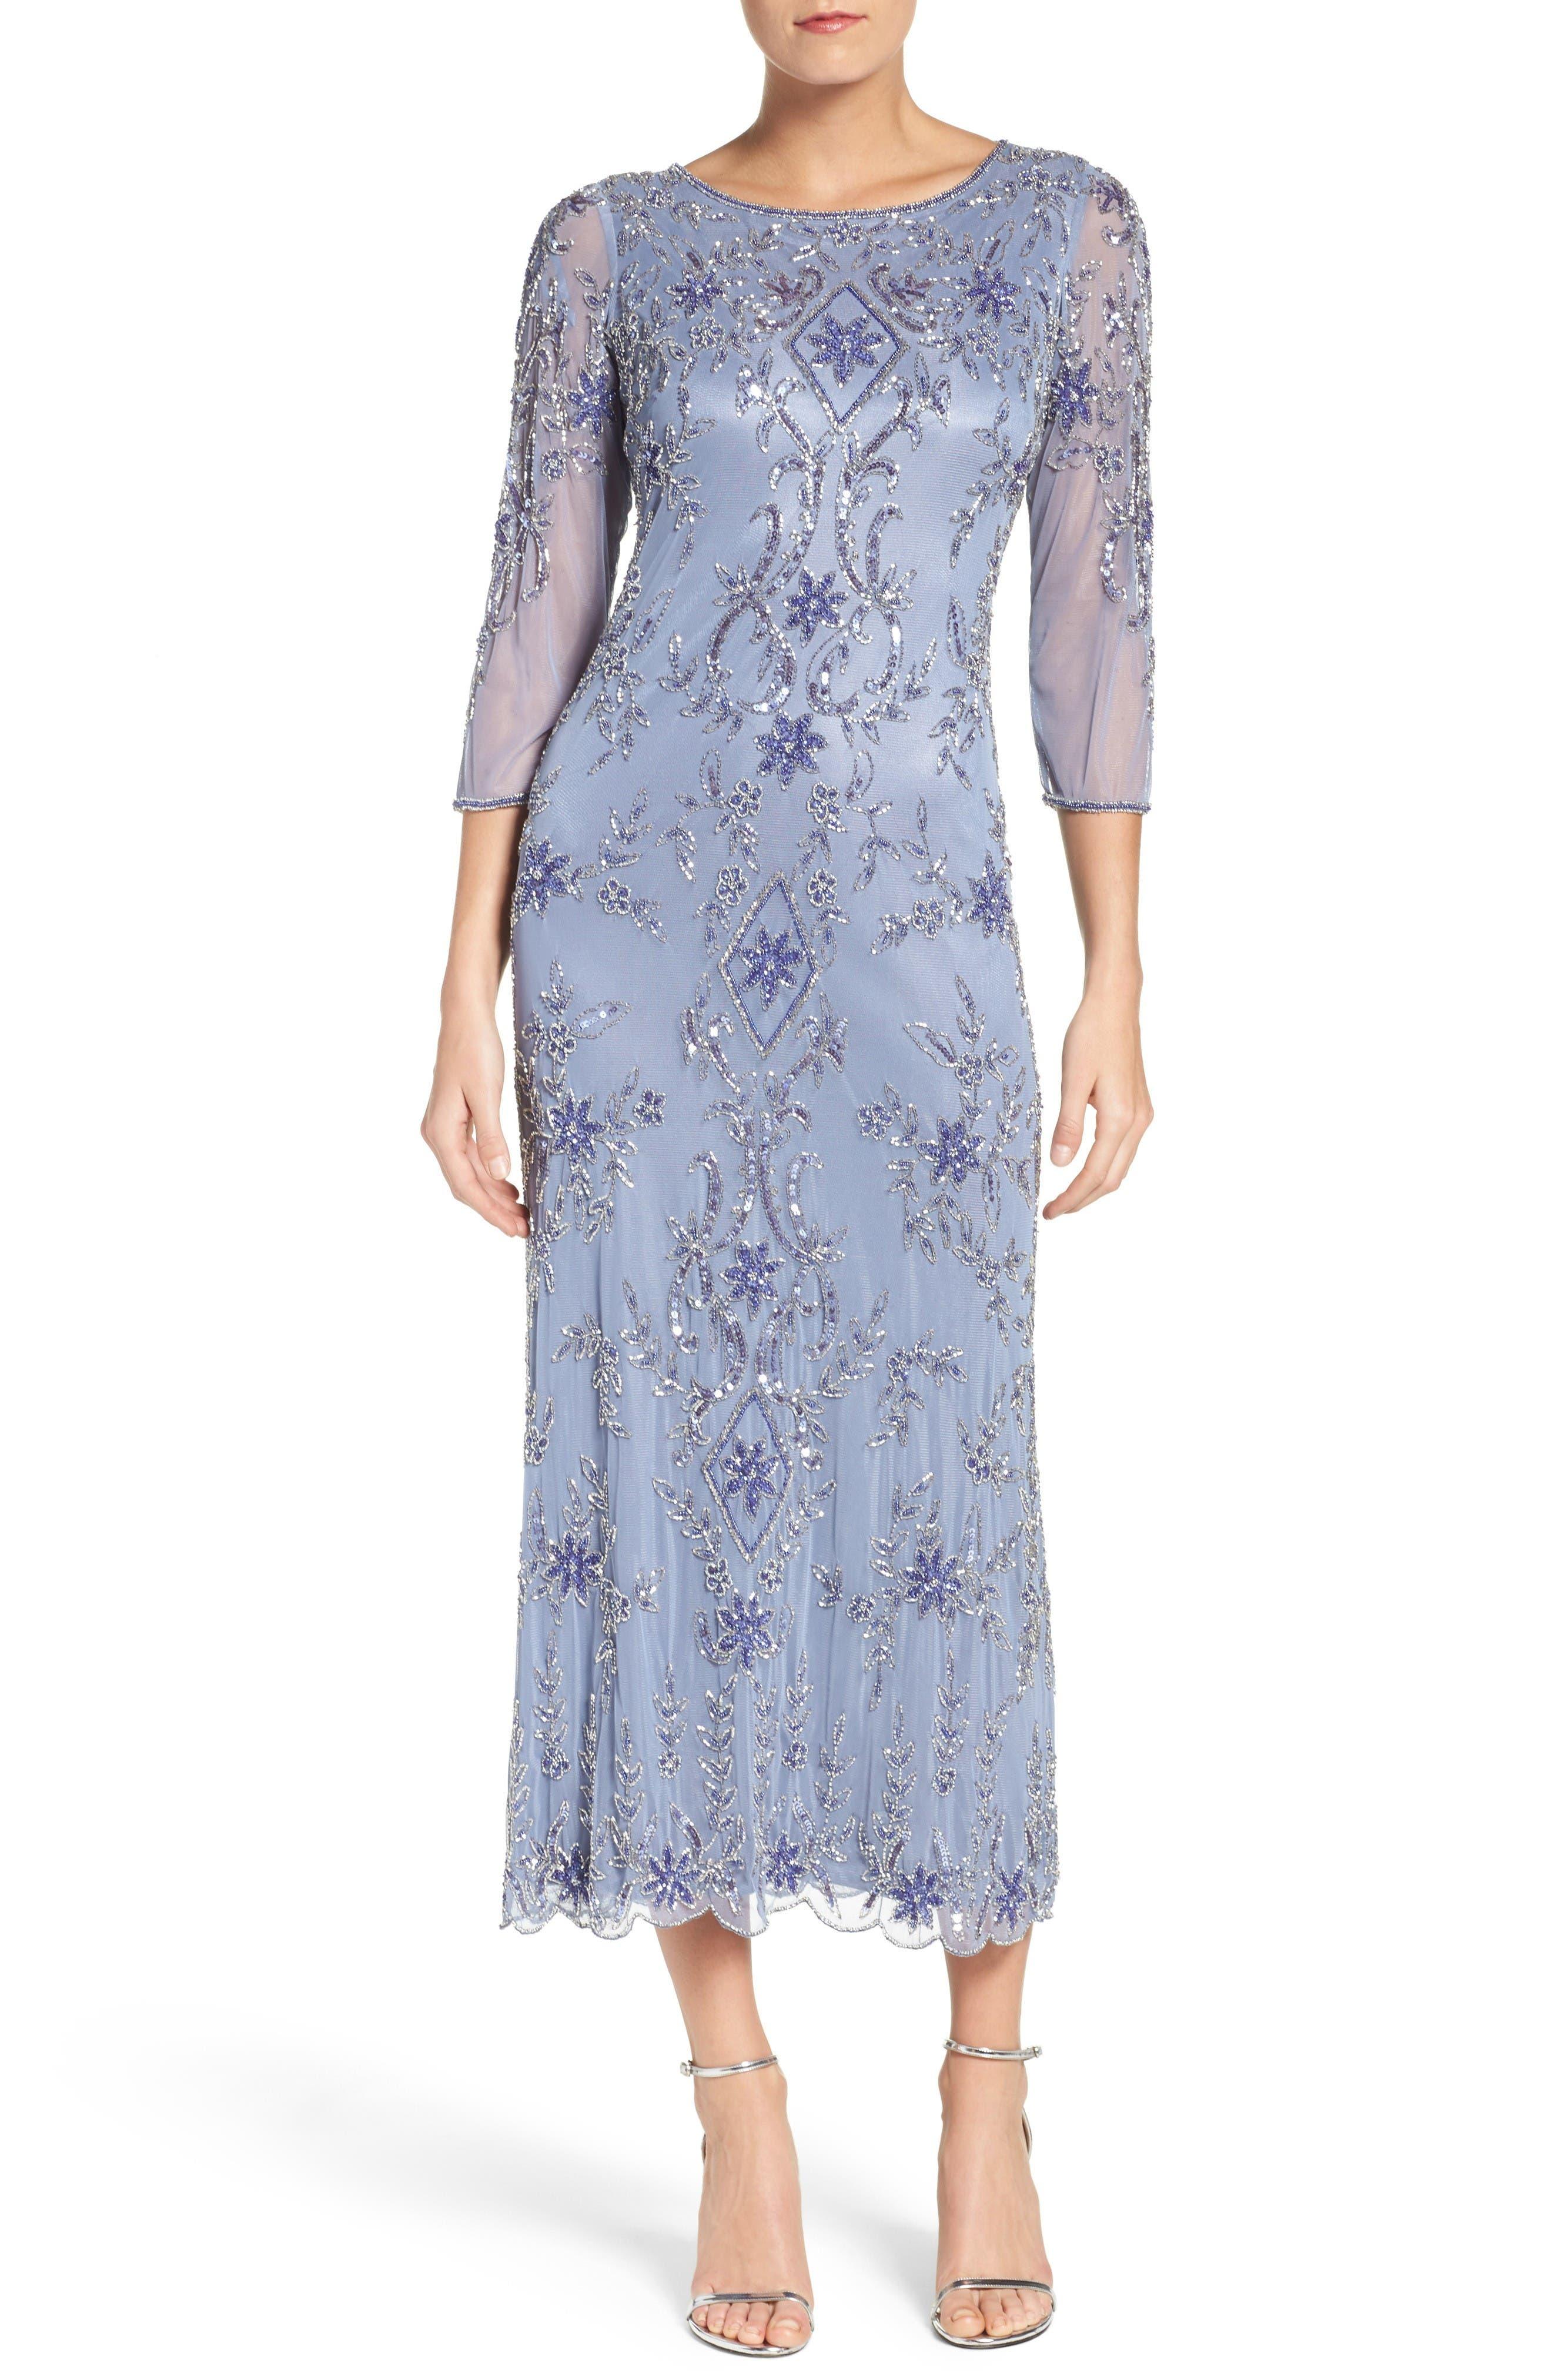 Main Image - Pisarro Nights Embellished Mesh Dress